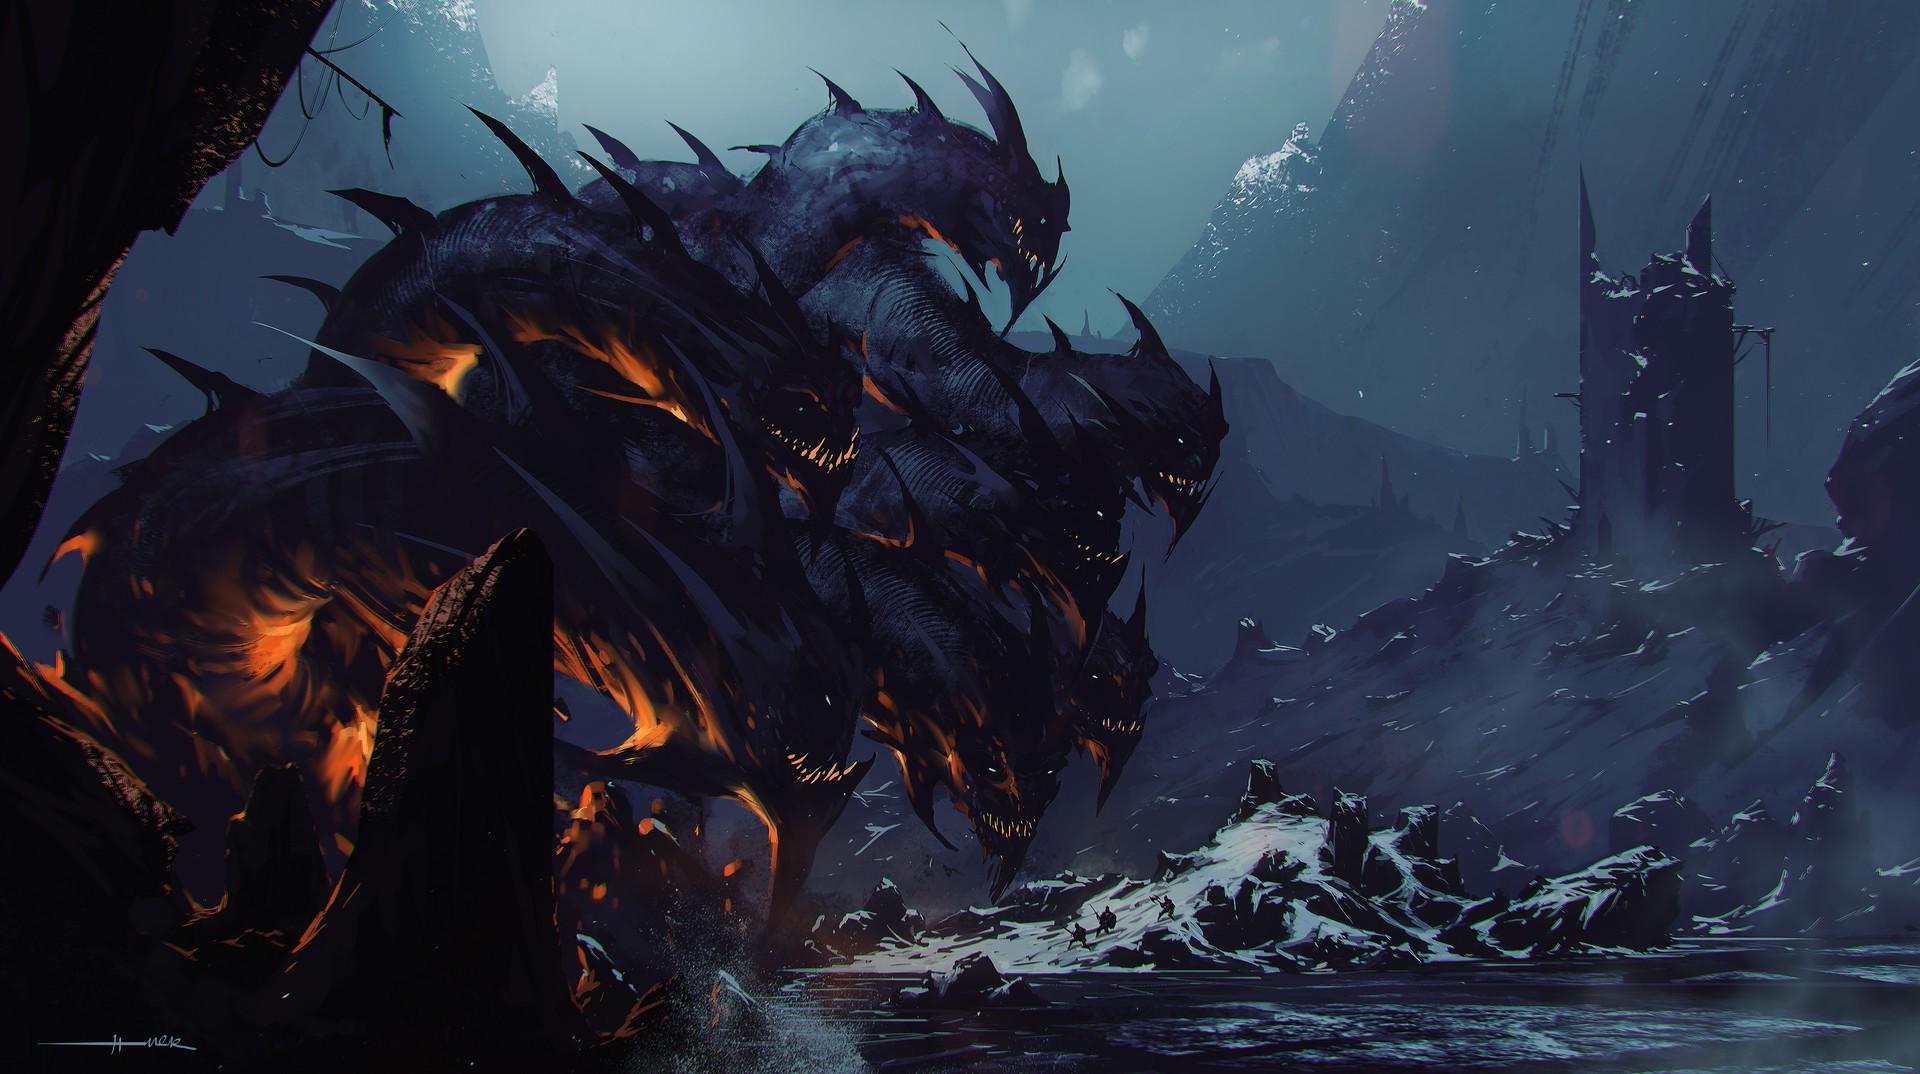 Painting Illustration Digital Art Artwork Graphic Design Dark Fantasy Concept Dragon Hydra Mythology Ghost Ship